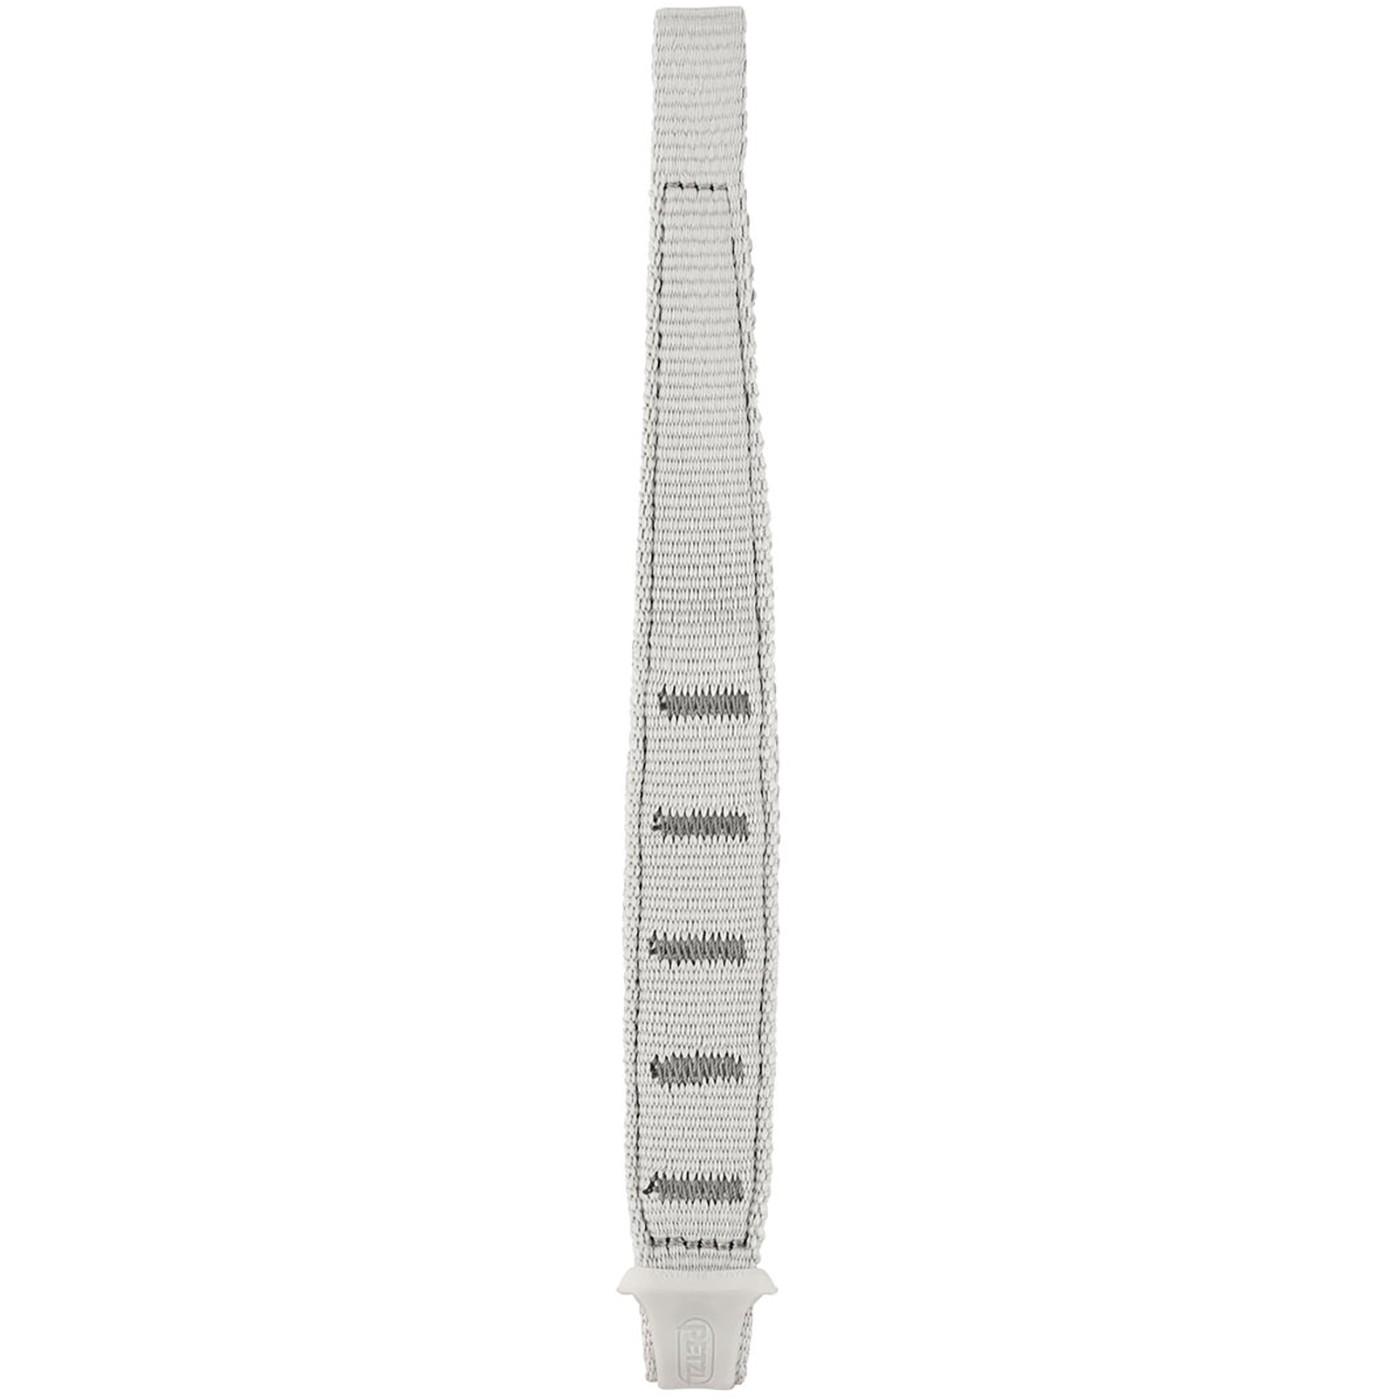 Petzl Express Sling - 25cm